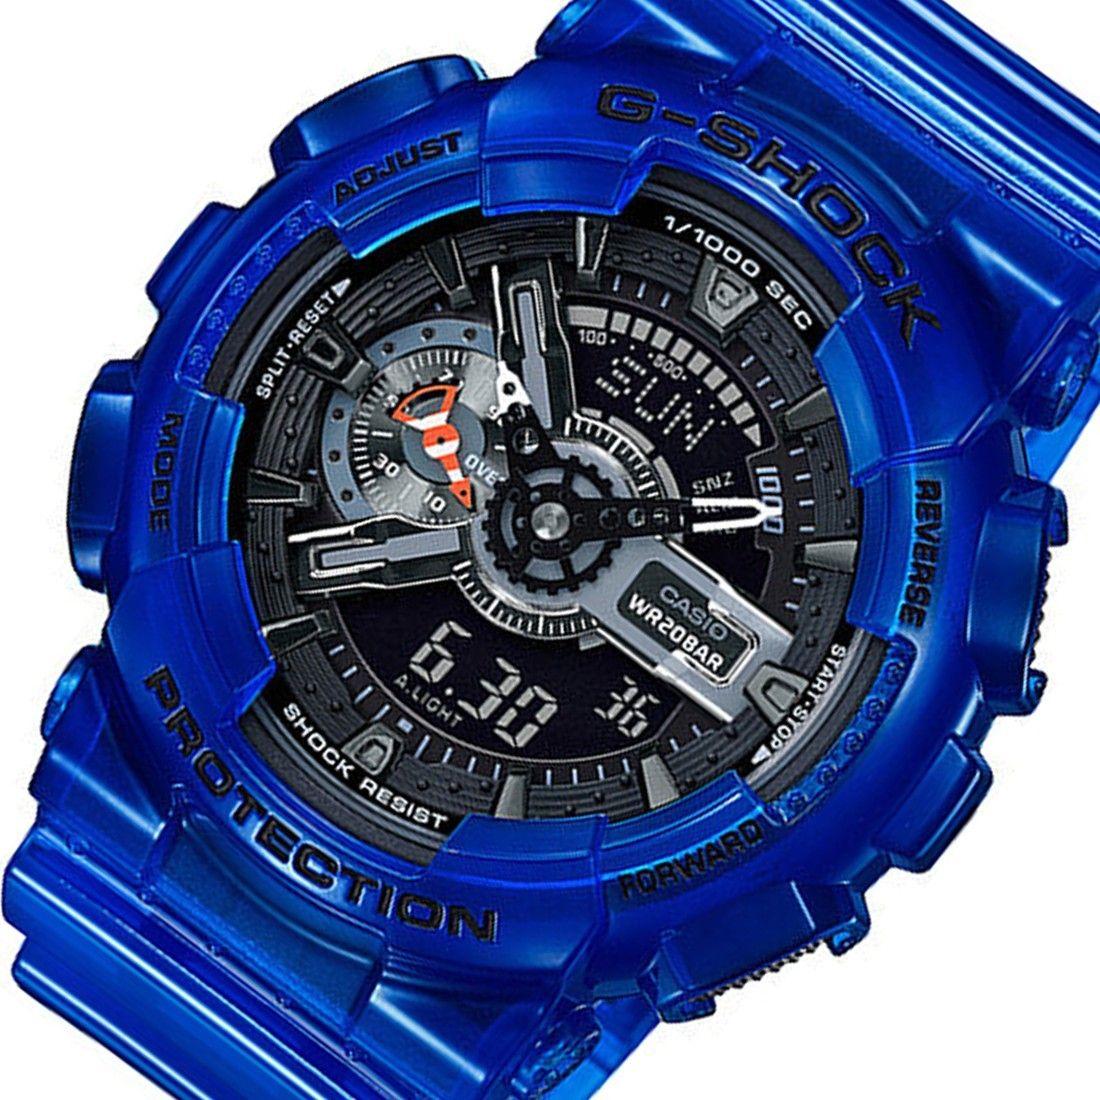 Ga 110cr 2adr 2a Casio G Shock Mens Watch Gshock Original Gd 100ms 3er Limited Colorway A Watchescom